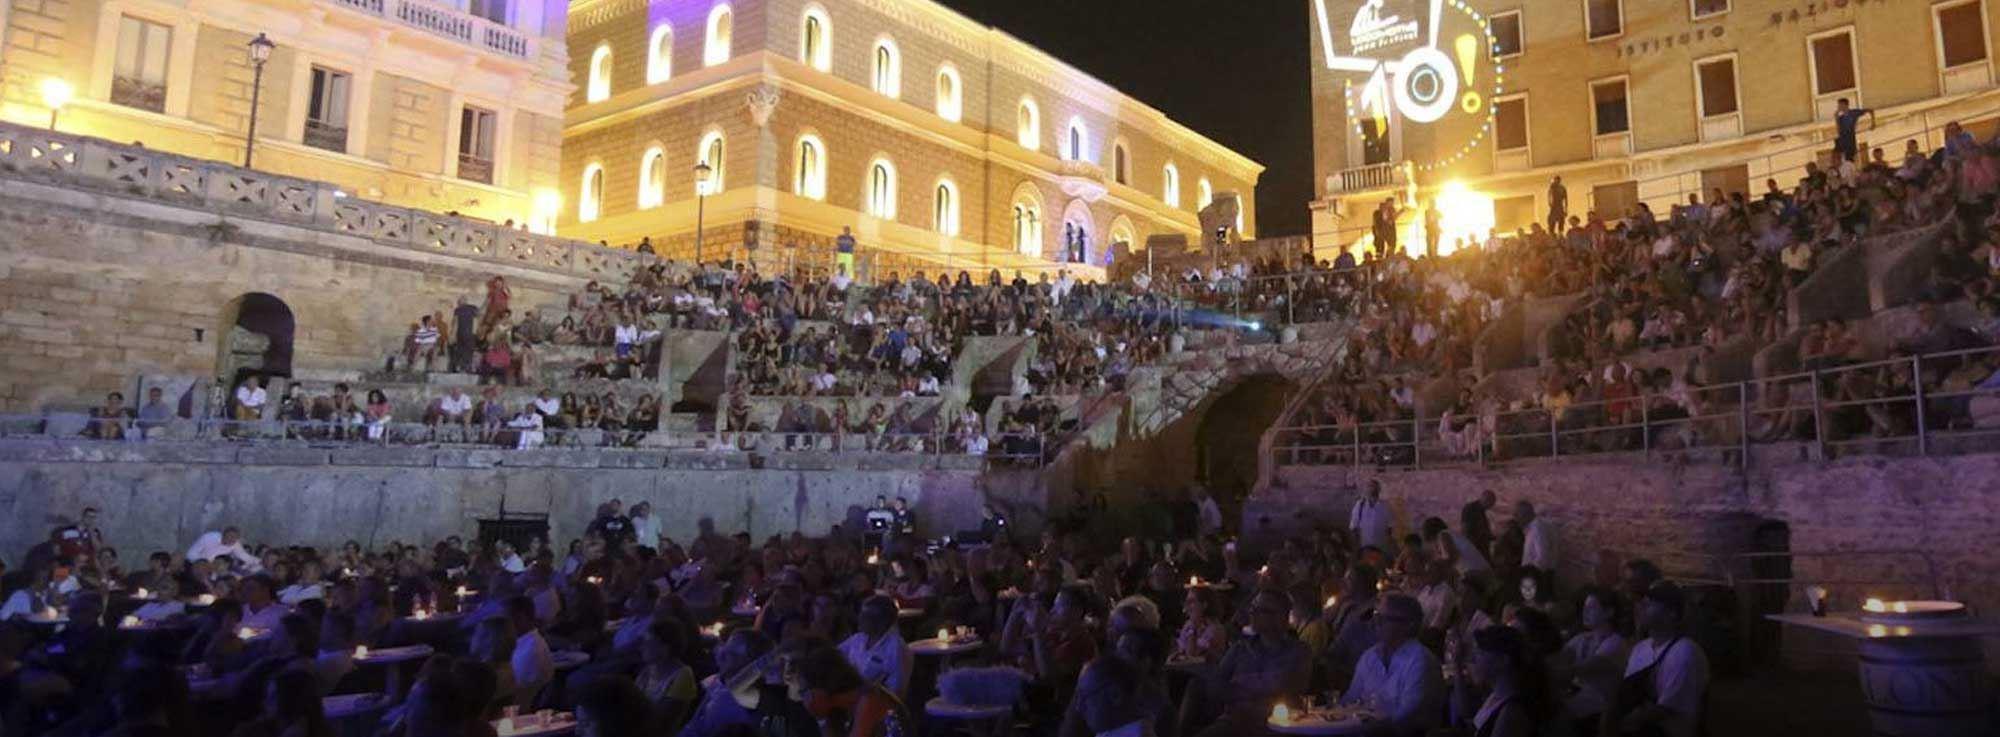 Lecce e dintorni: Locomotive Jazz Festival